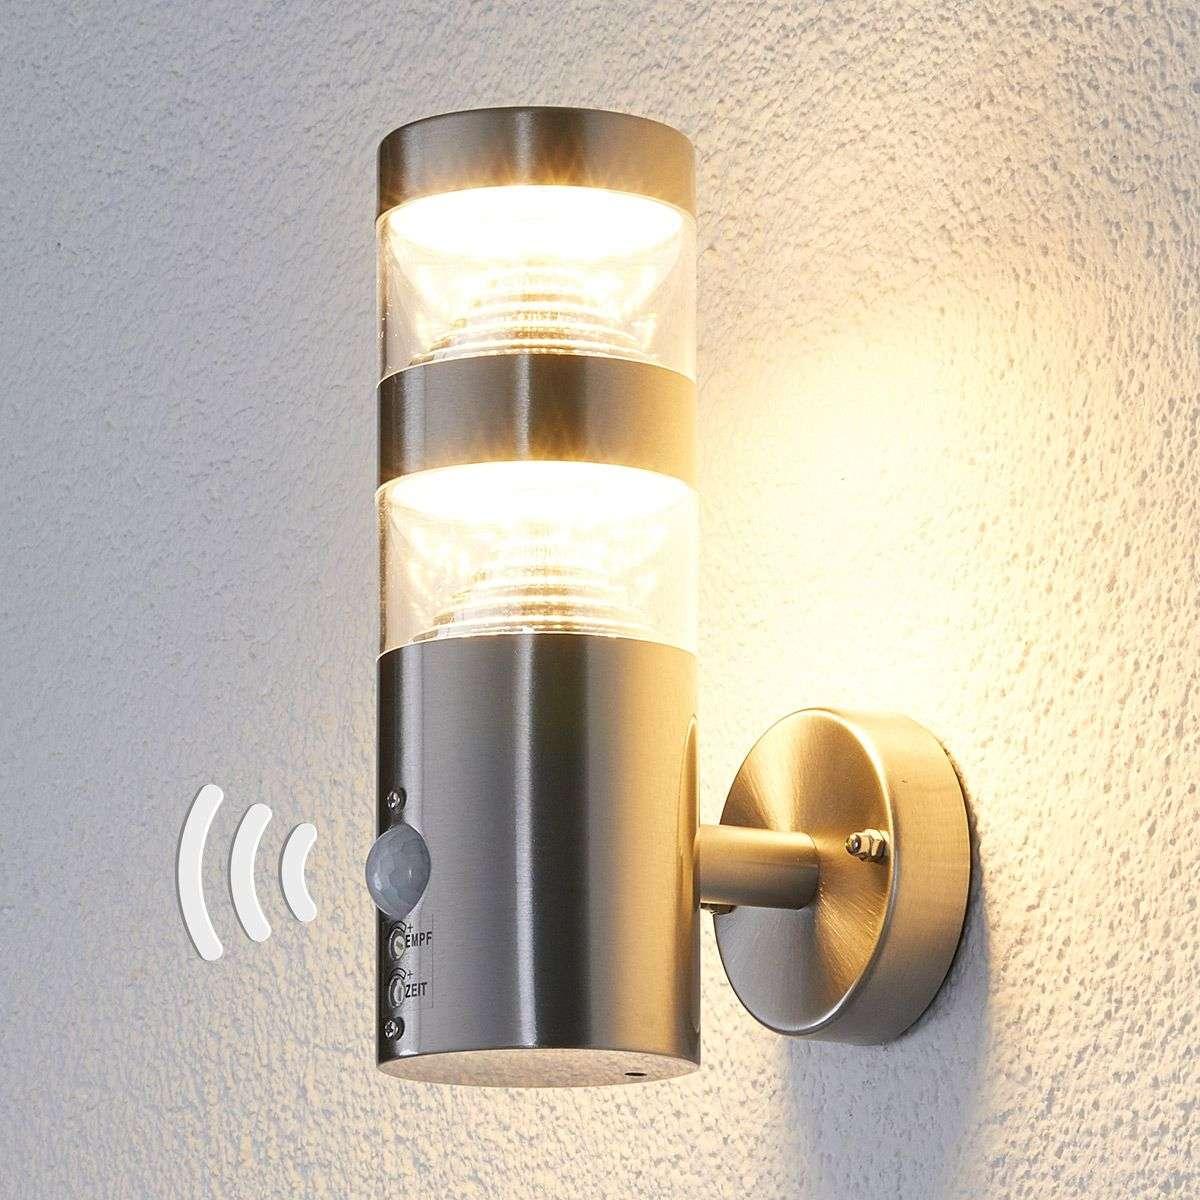 Led Outdoor Wall Light Lanea With Motion Sensor Lights Ie